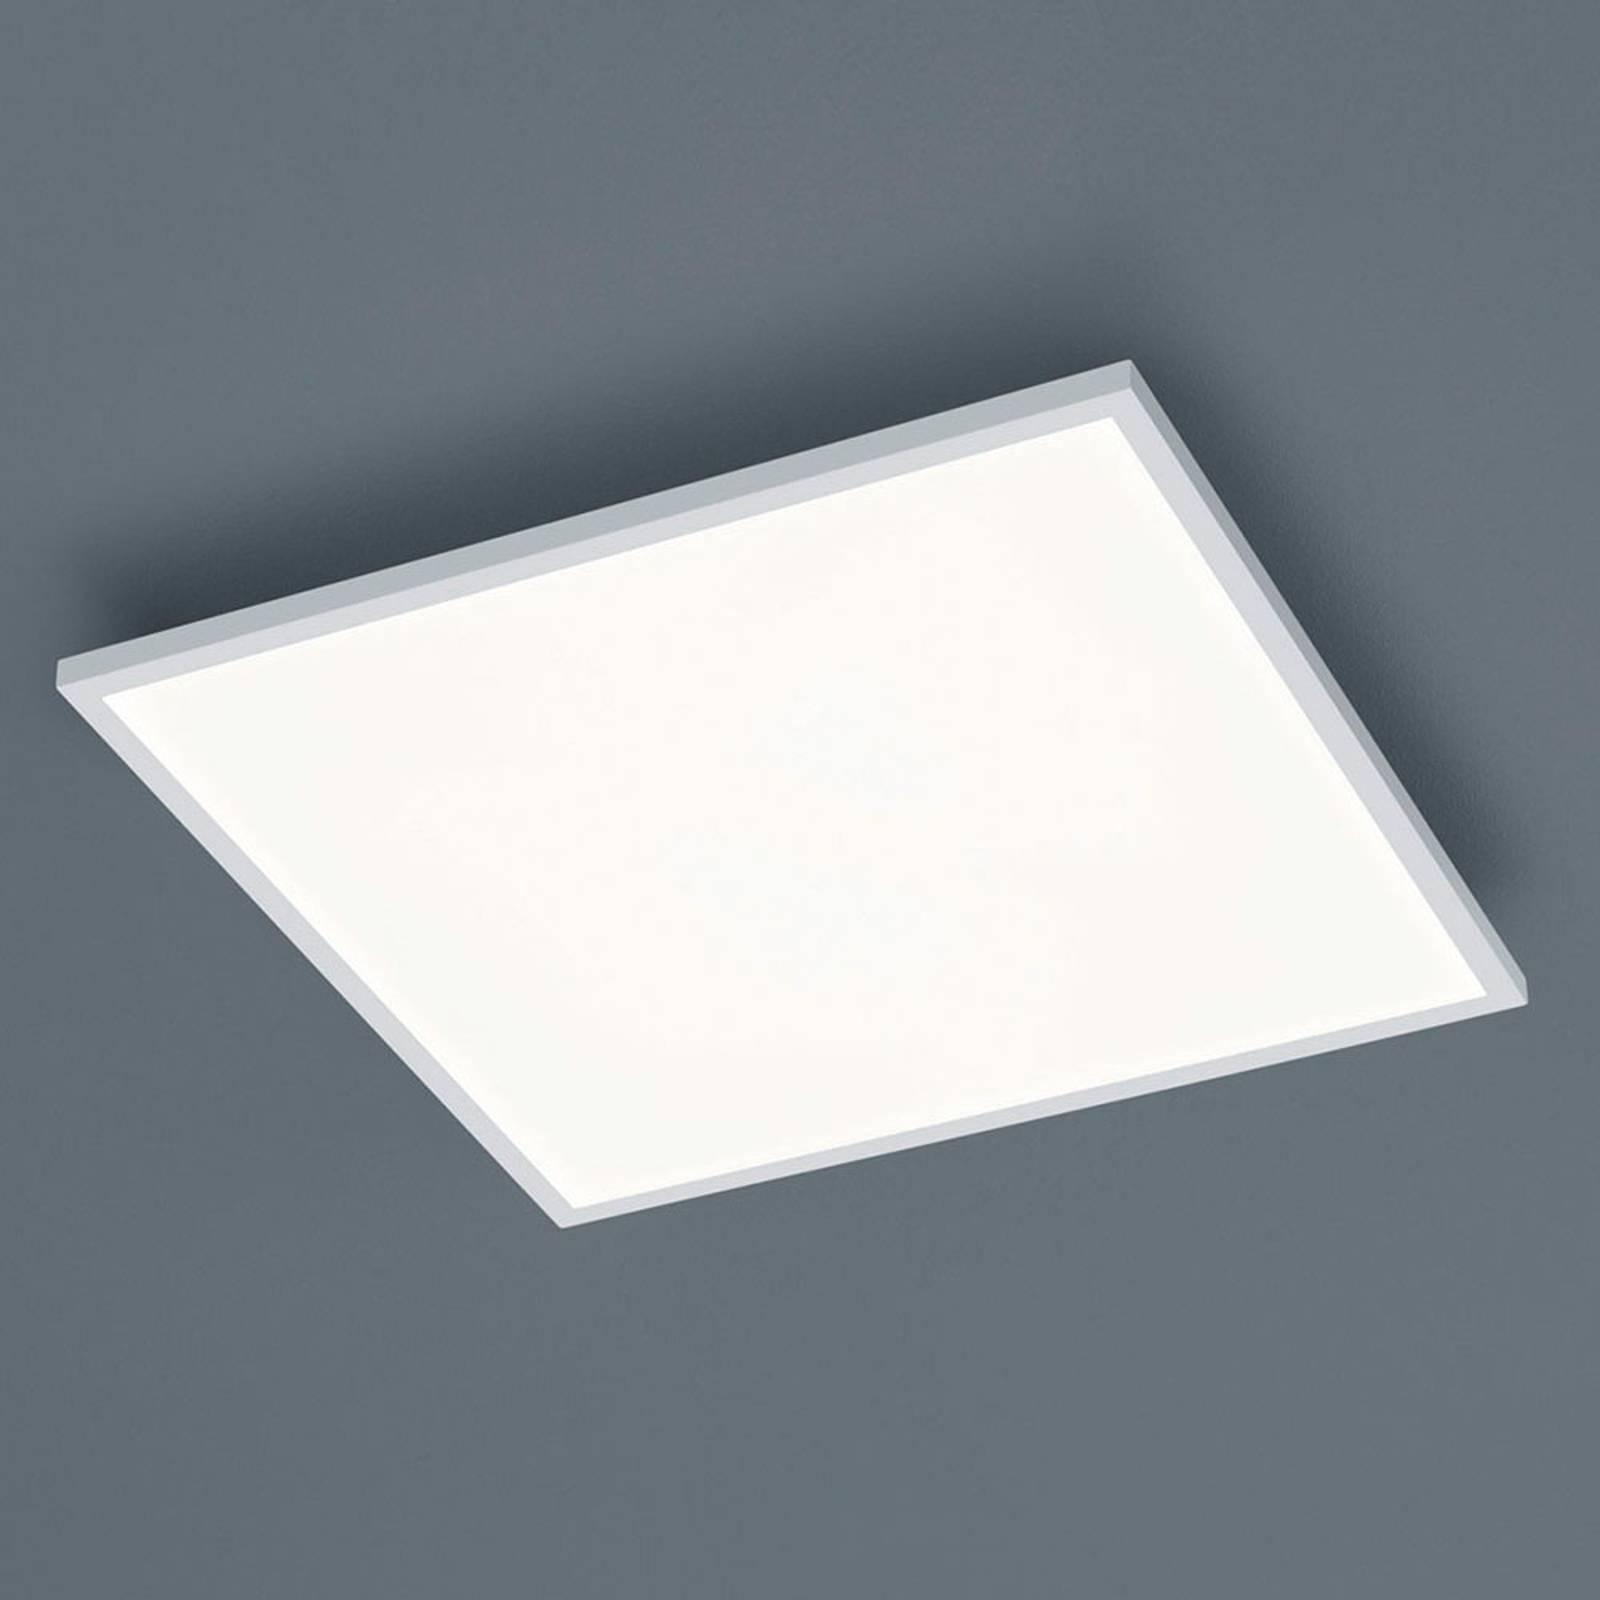 Helestra Rack LED plafondlamp dimbaar hoekig wit